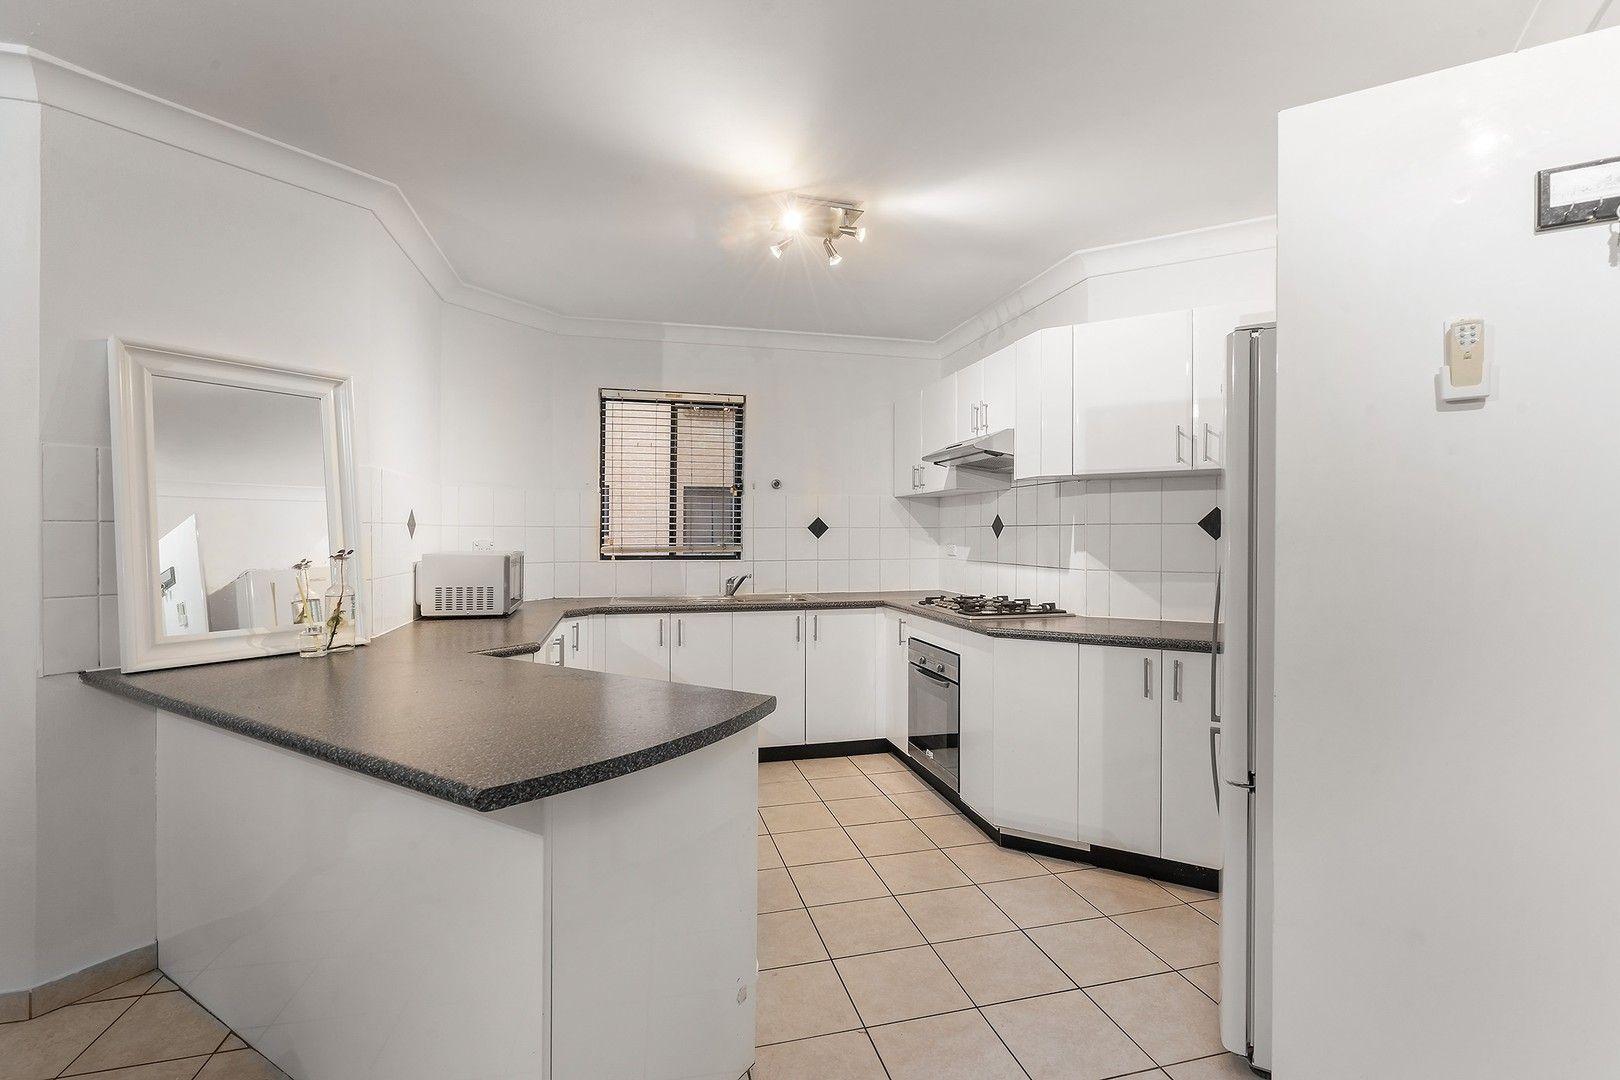 6/82-84 Beaconsfield Street, Silverwater NSW 2128, Image 2